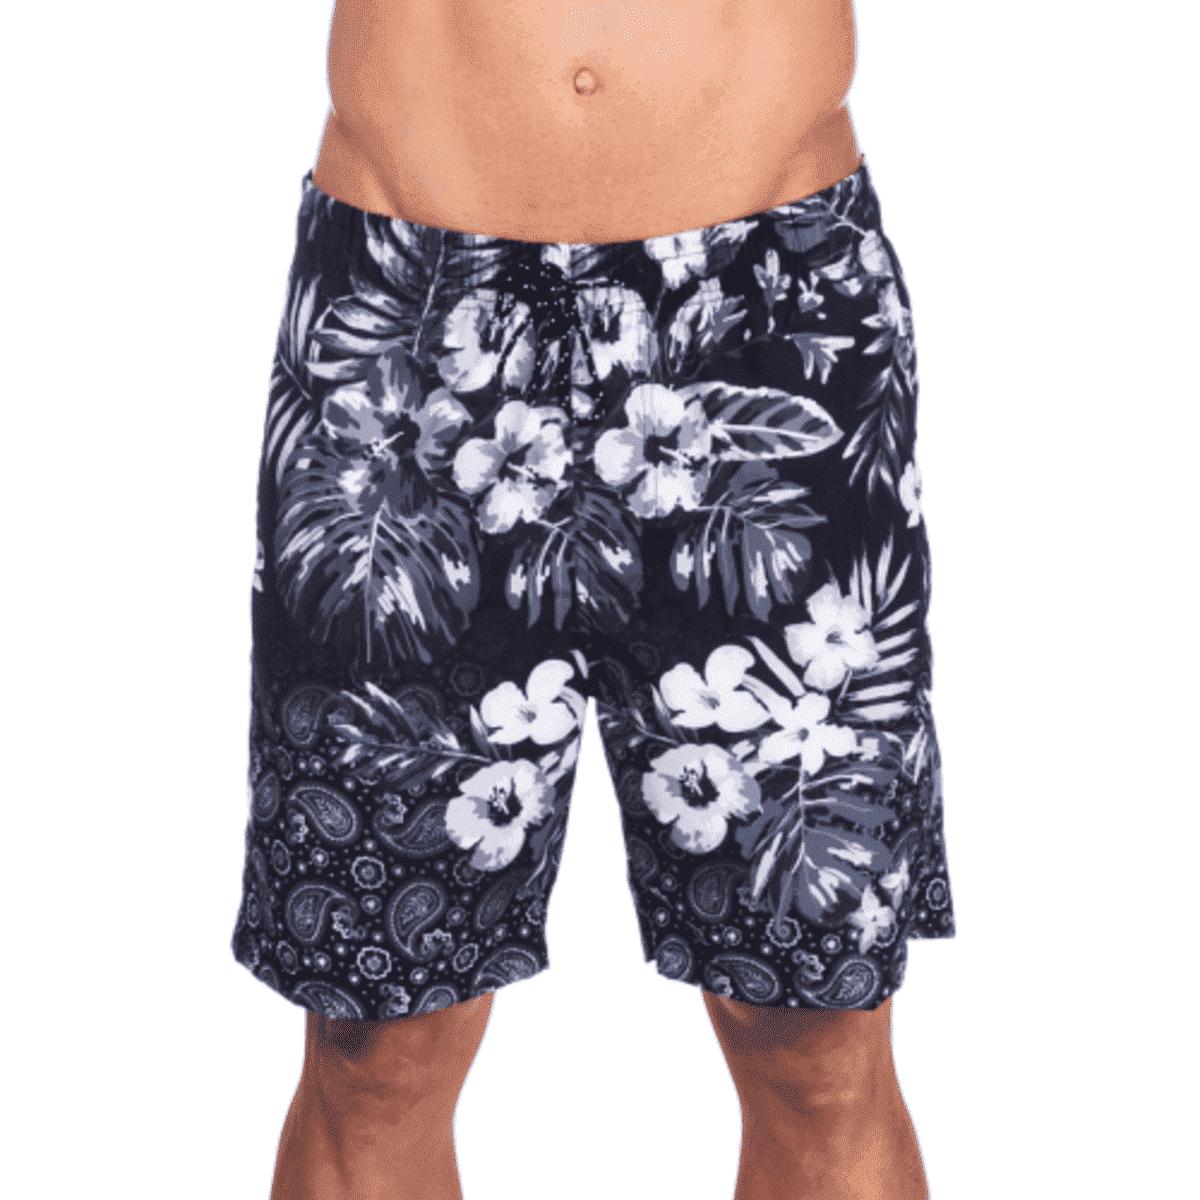 Kit 5 Short Bermuda Moletom Masculina Florida Floral Atacado